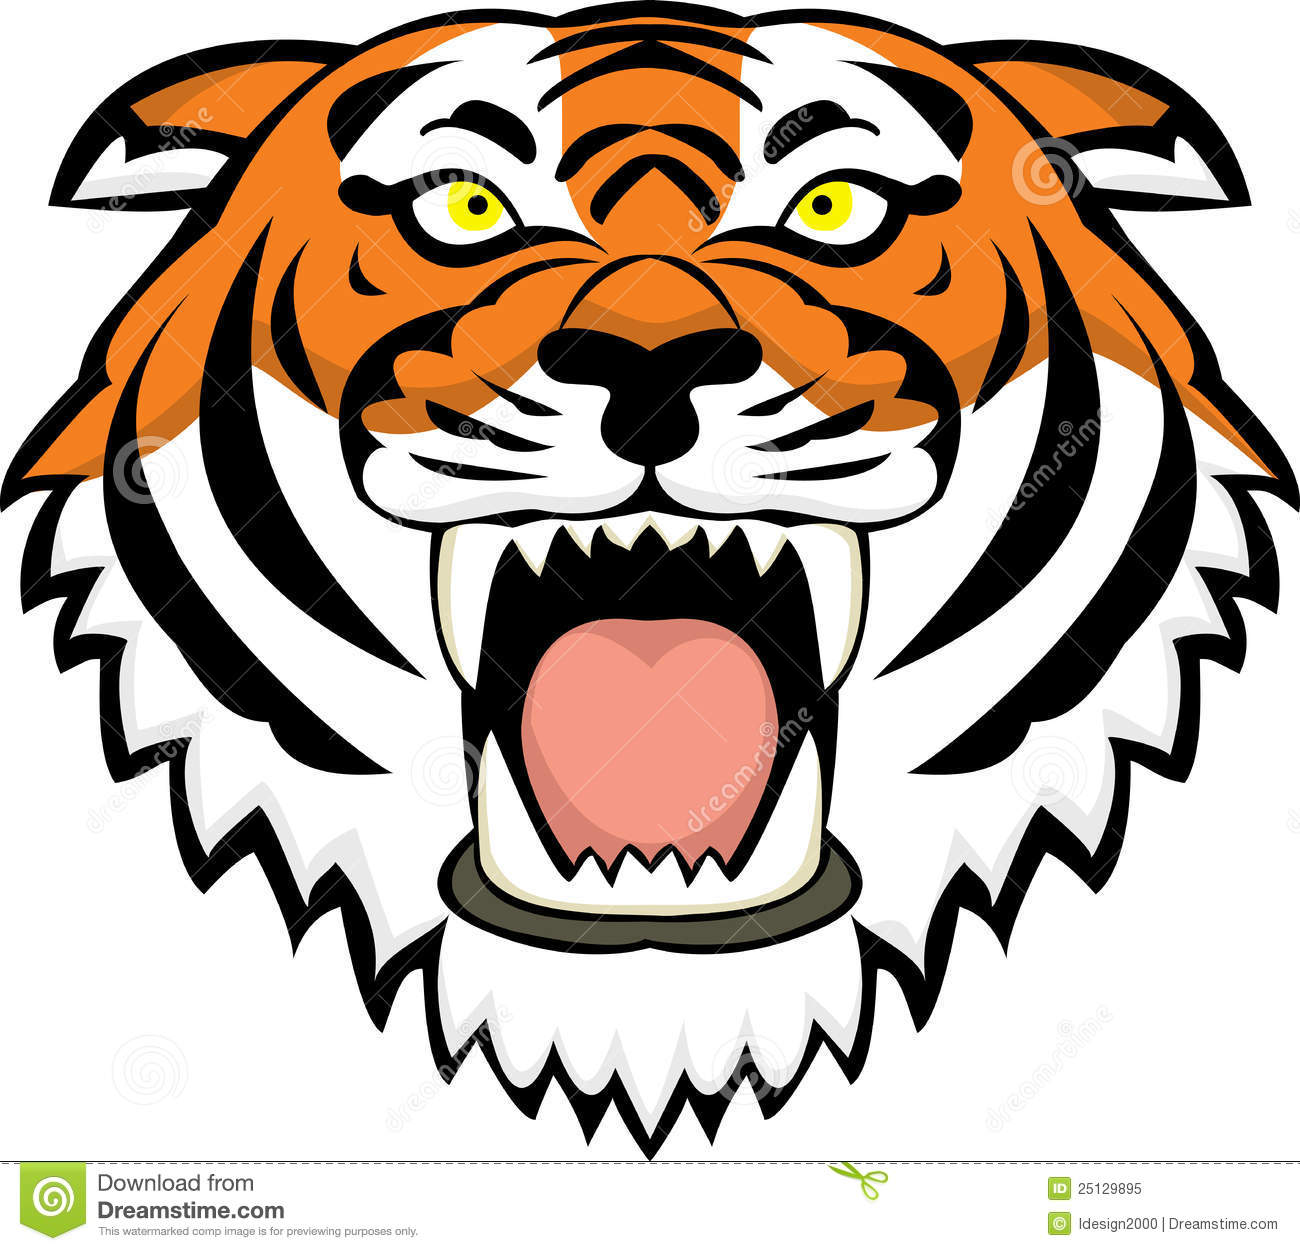 Tiger Face Clipart.